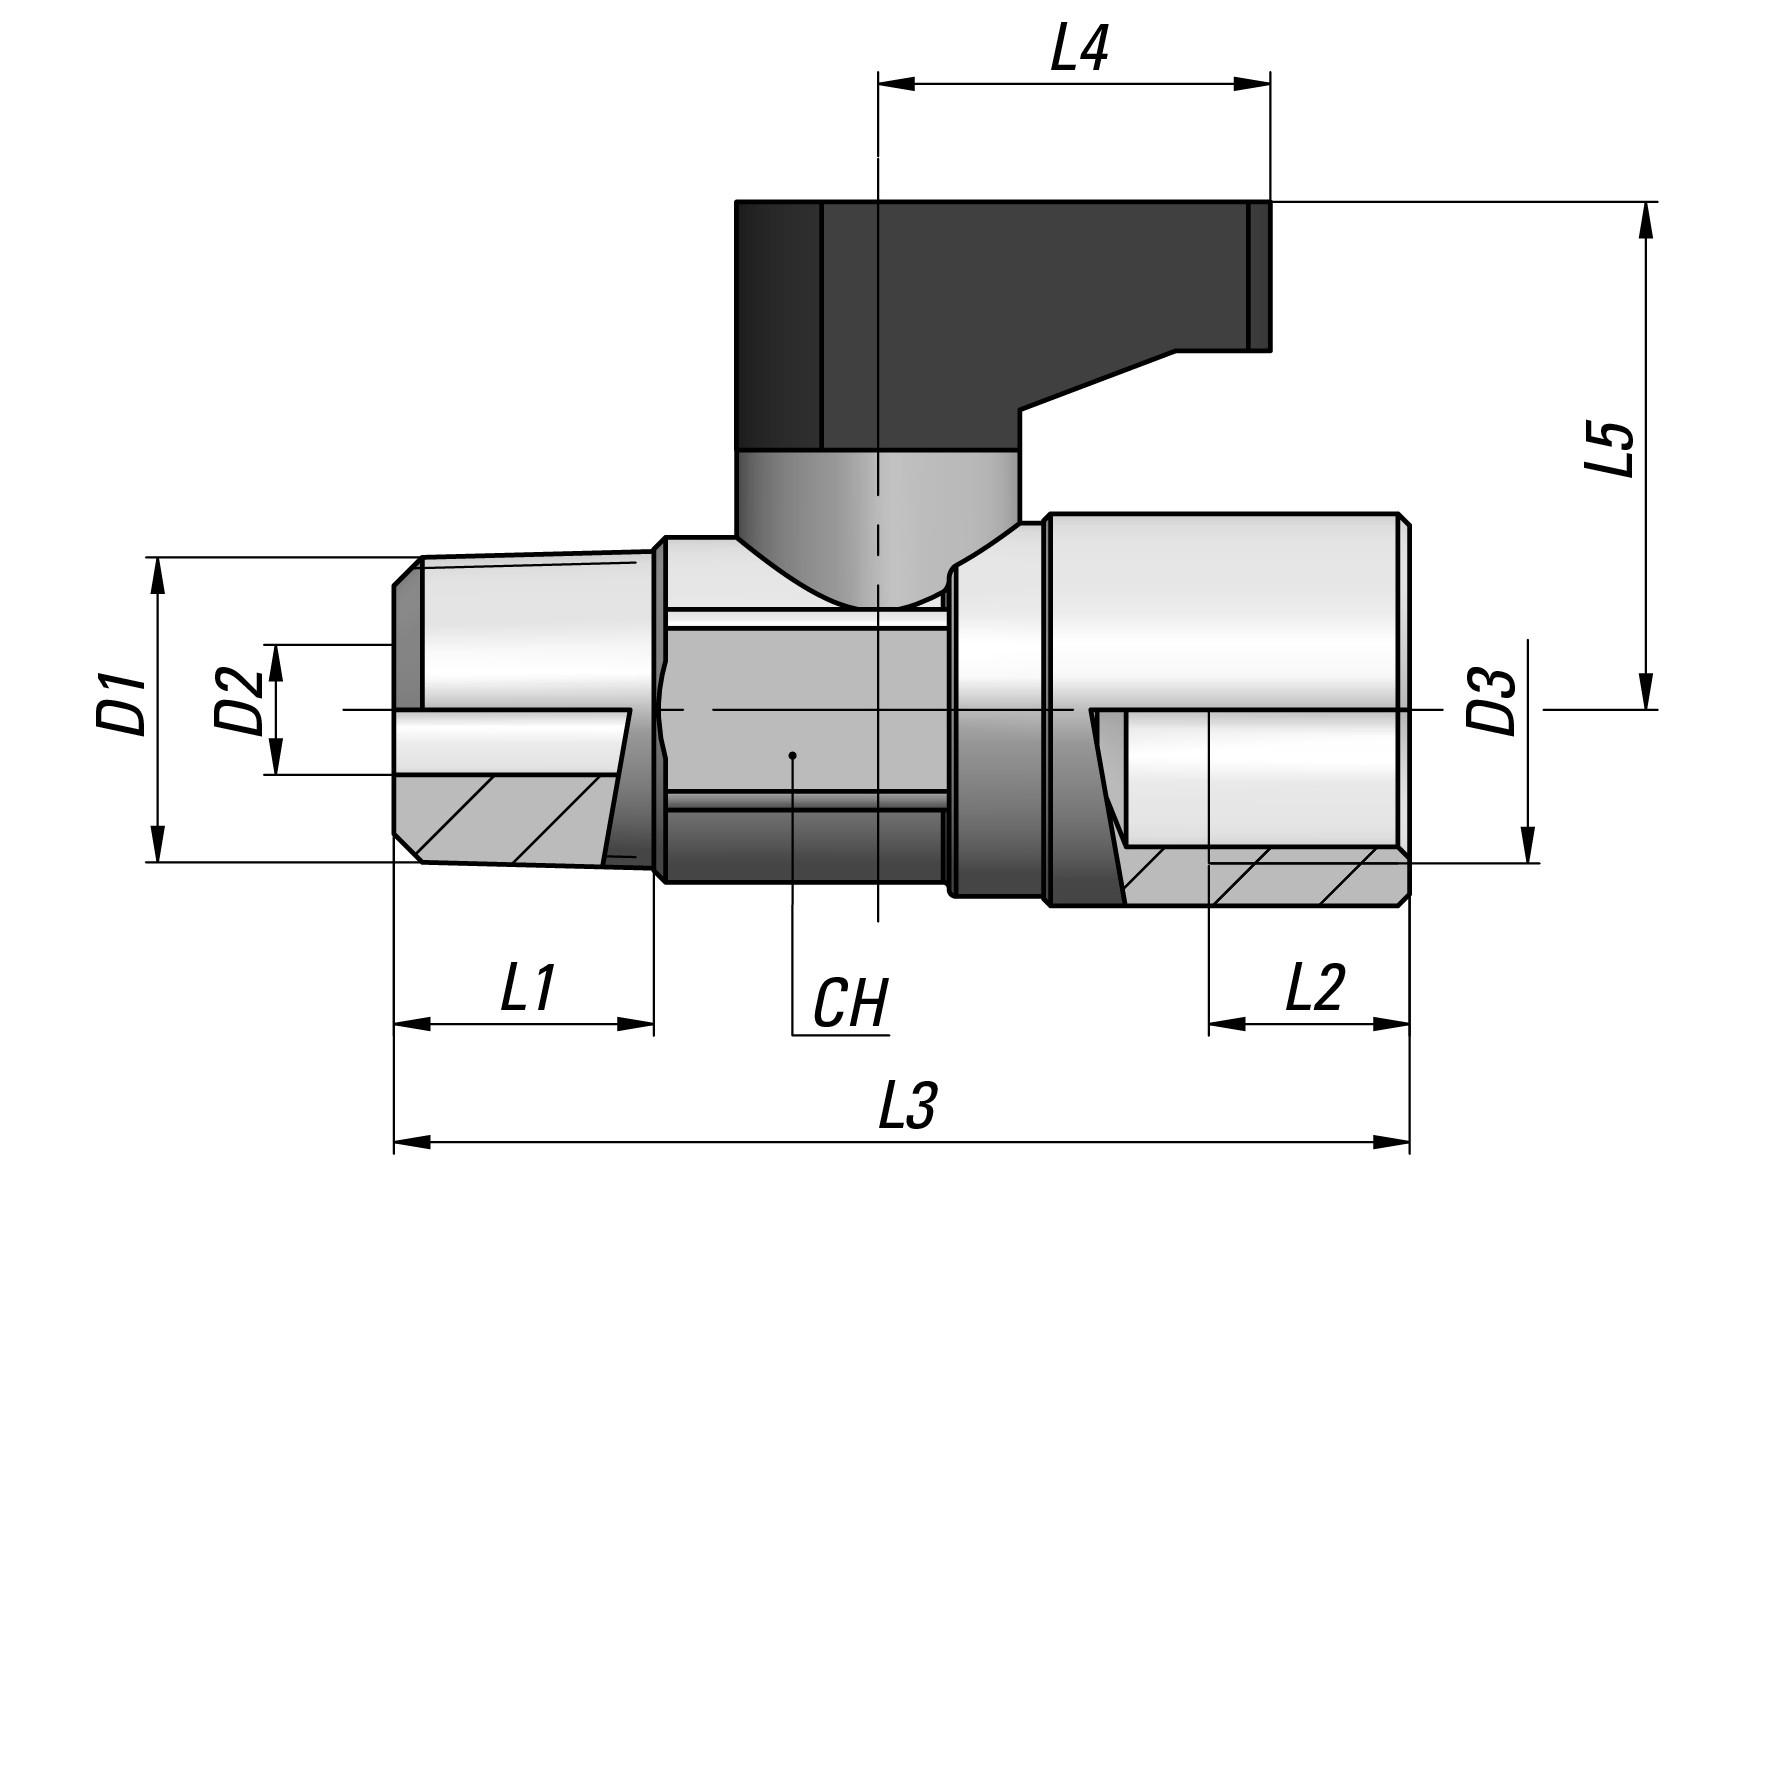 MV54 00 18